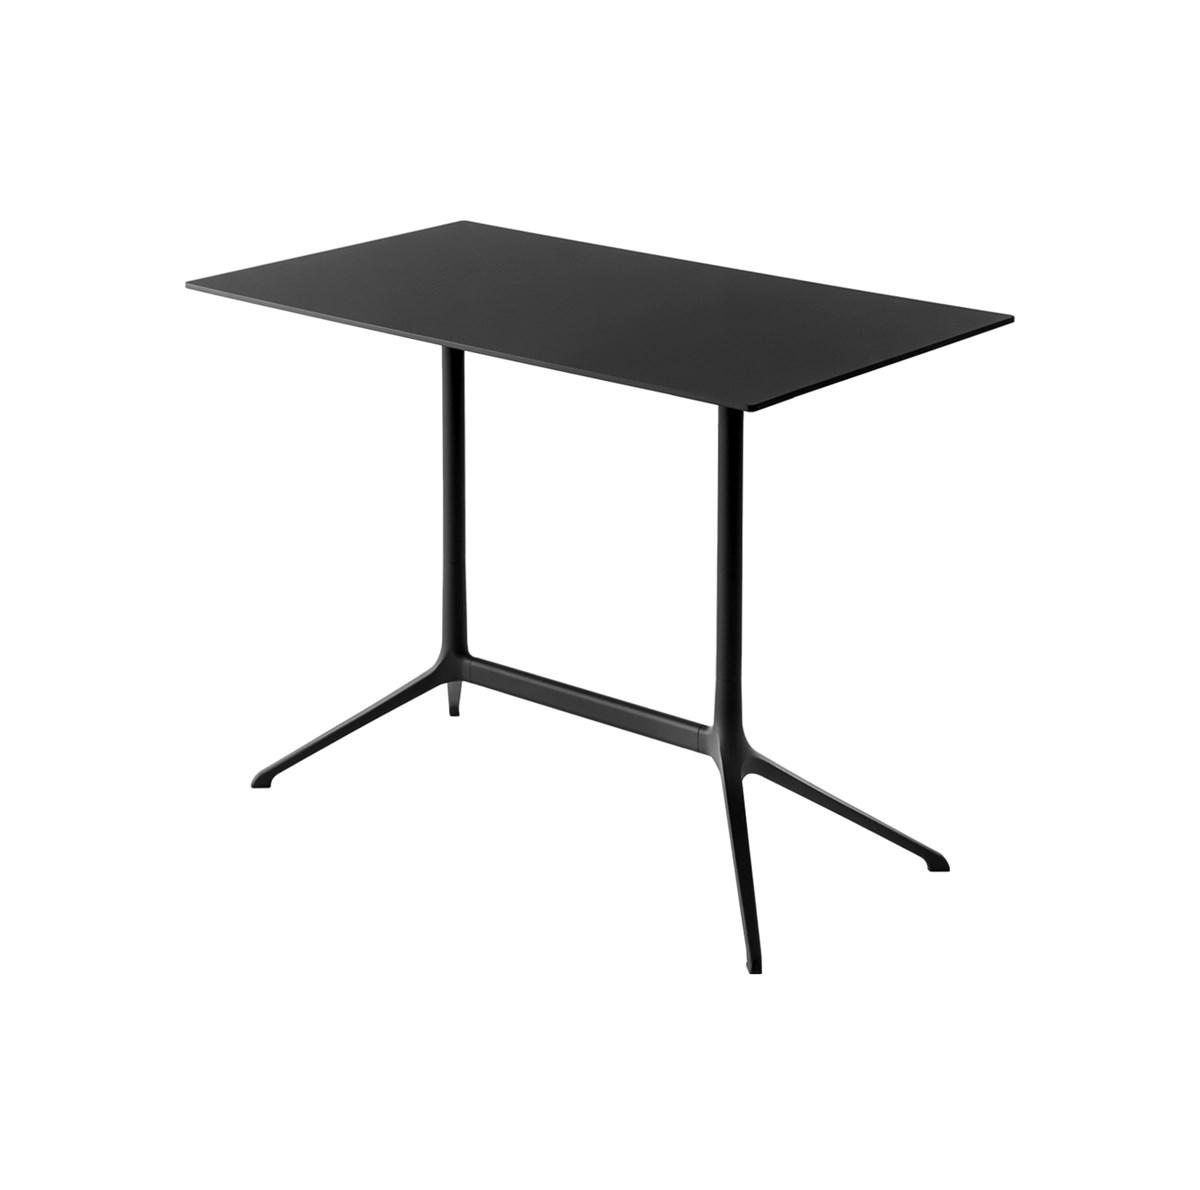 Kristalia-Neuland.-Paster-&-Geldmacher-Elephant-Table-Matisse-1